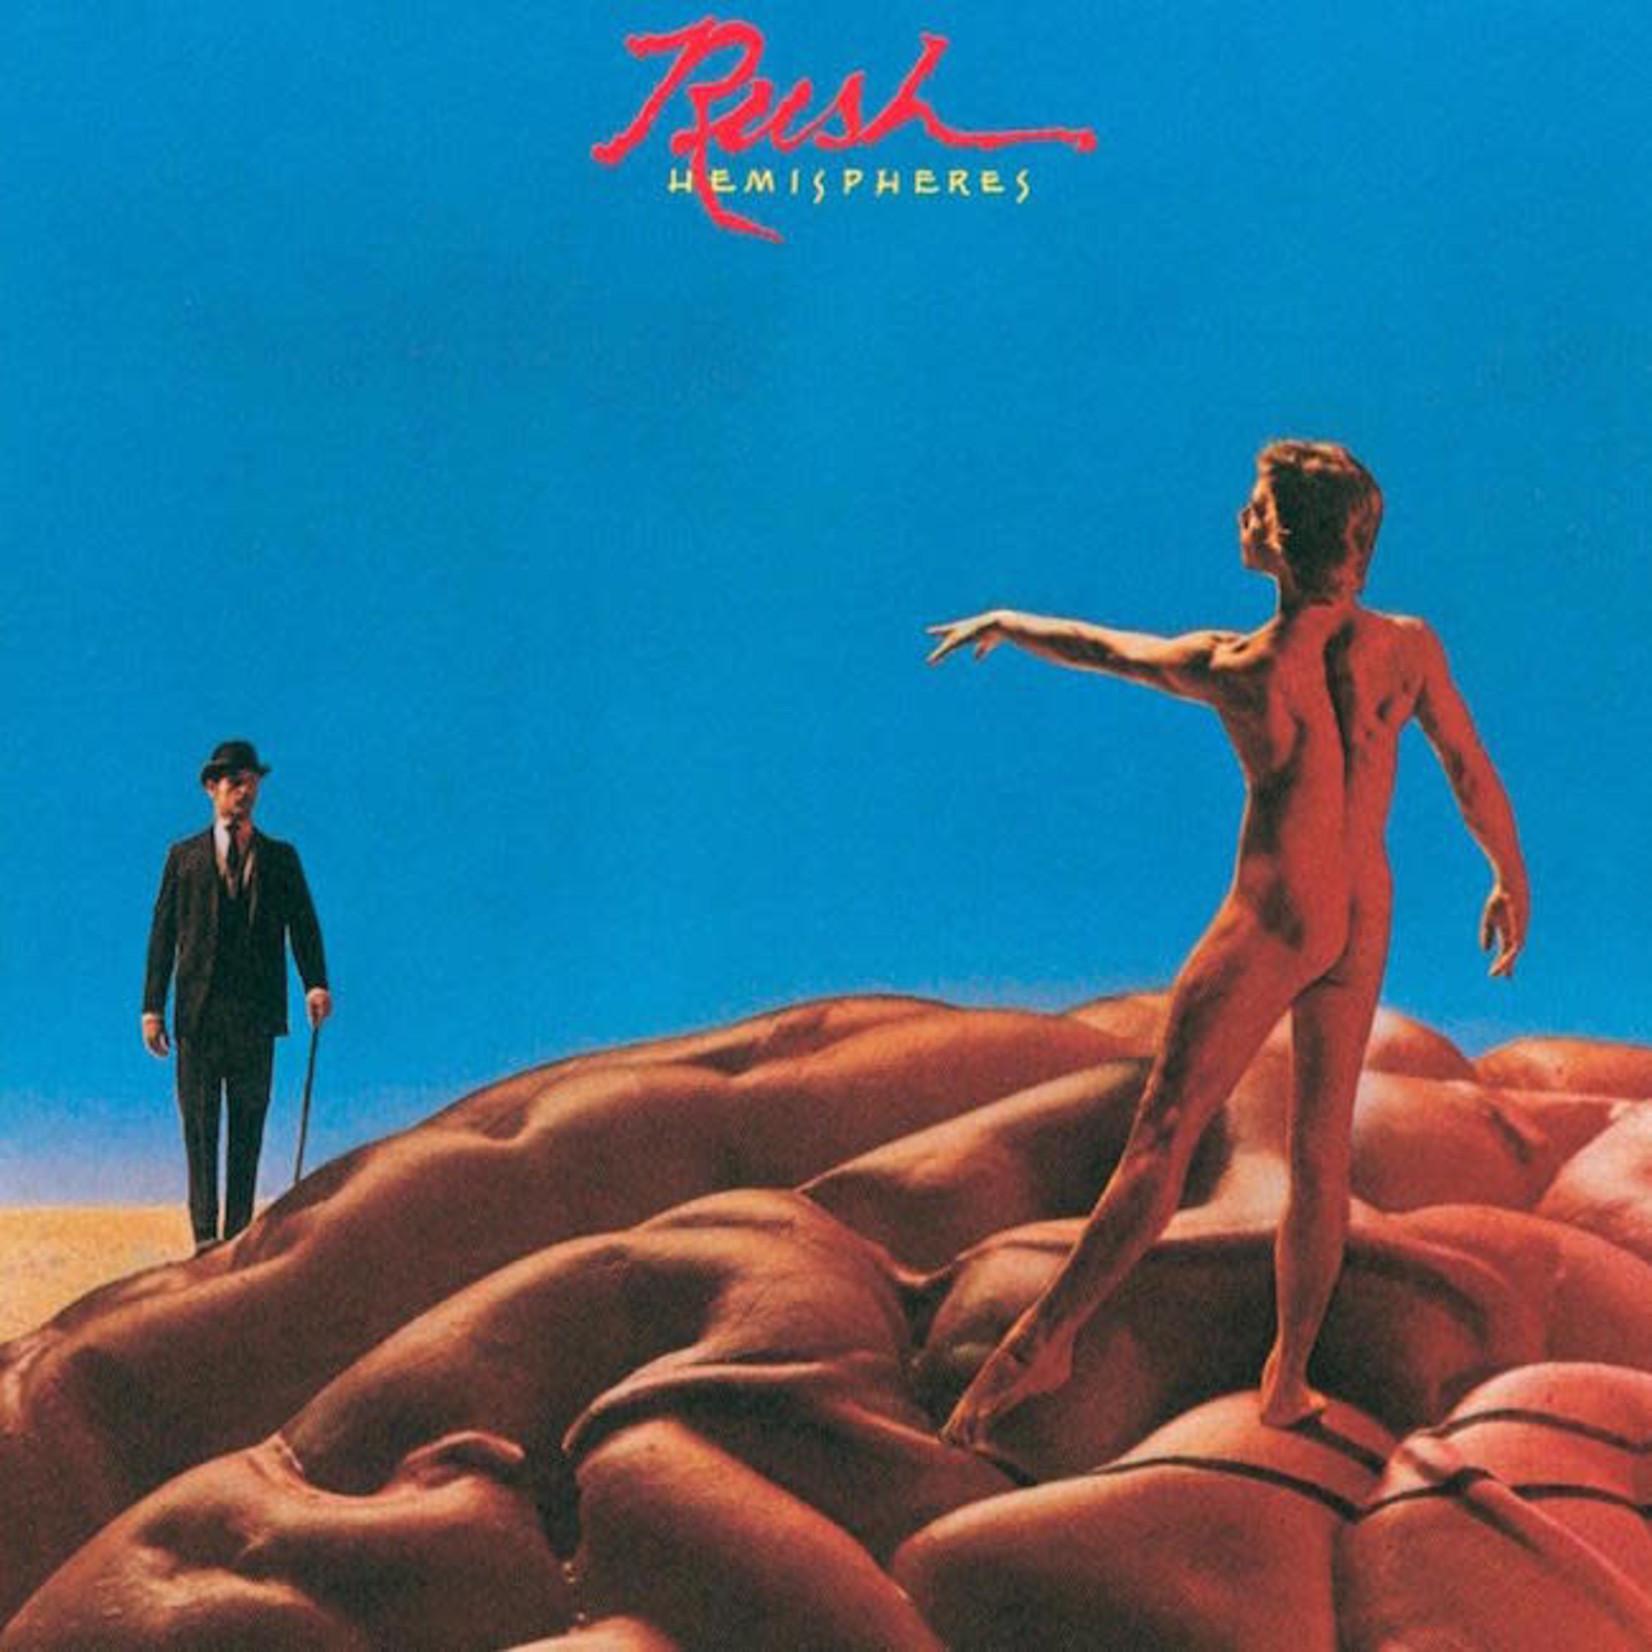 [Vintage] Rush: Hemispheres (with poster)